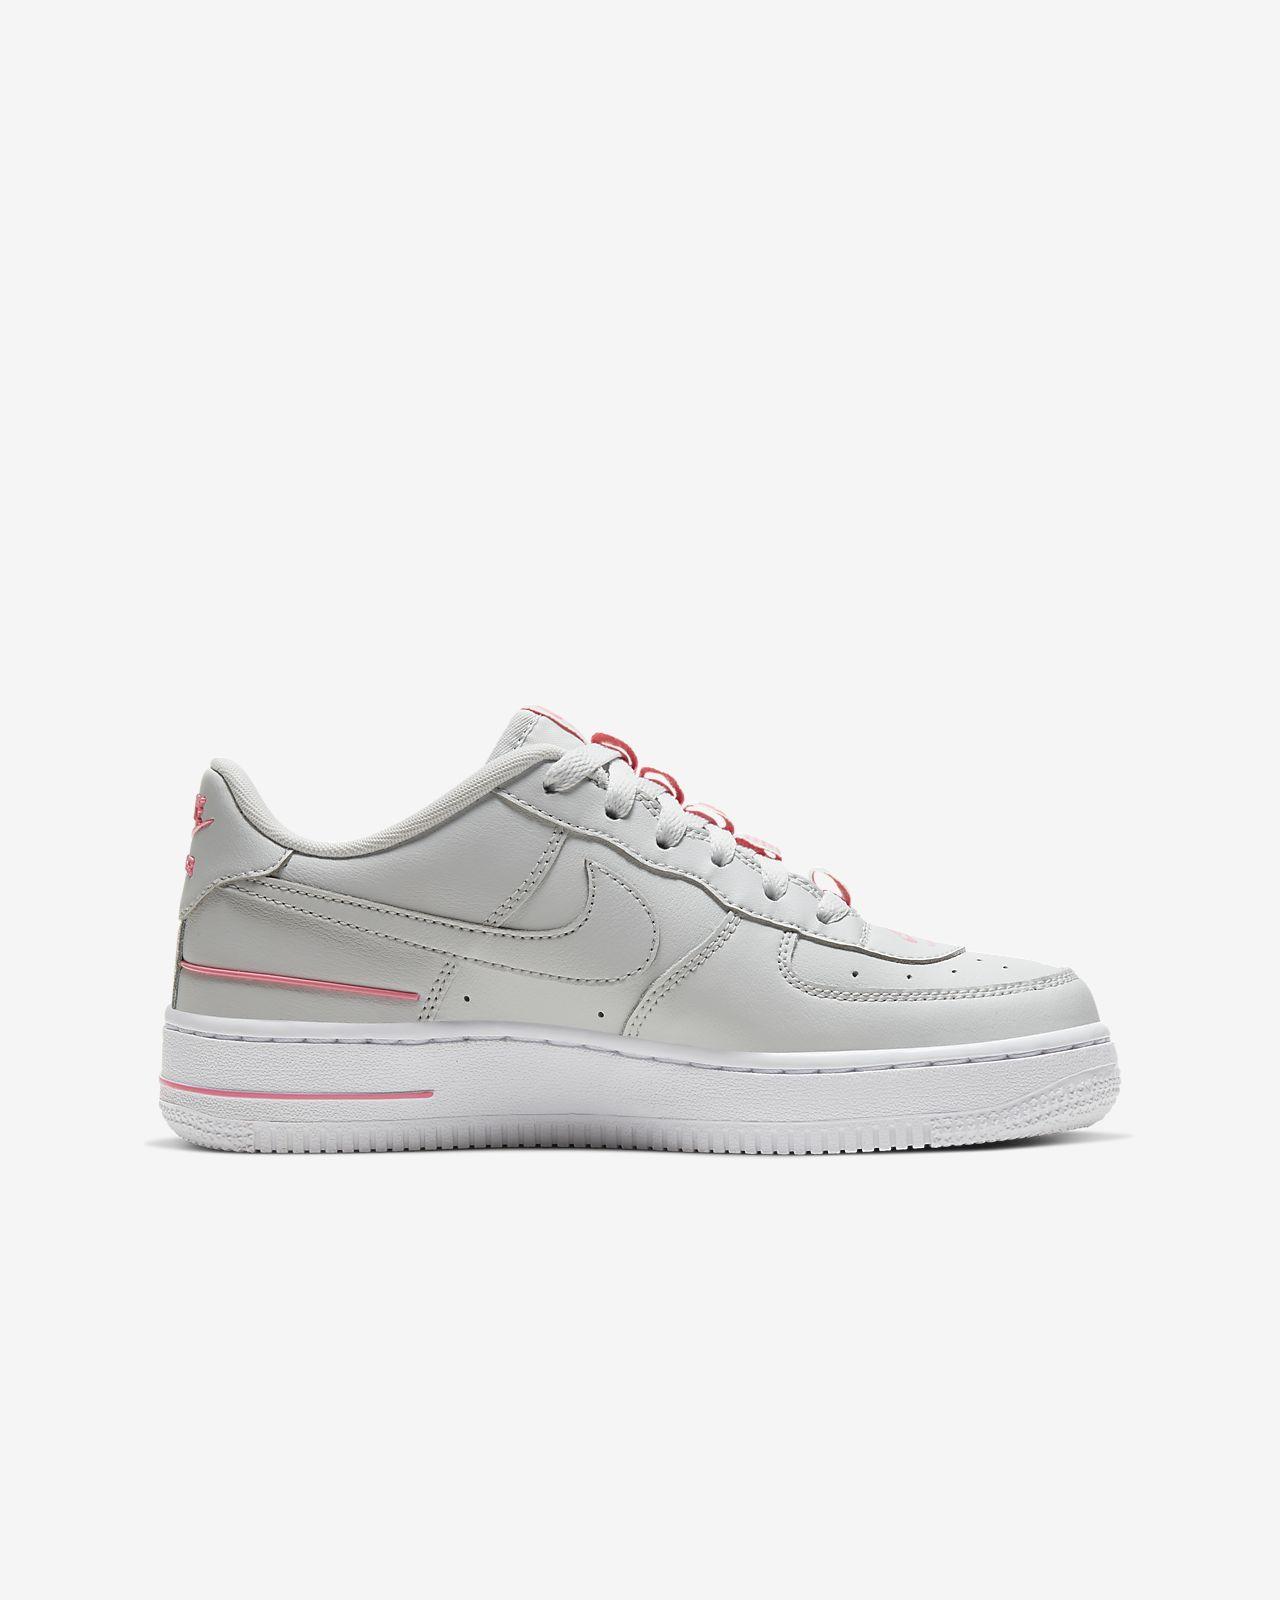 Scarpa Nike Air Force 1 LV8 3 Ragazzi